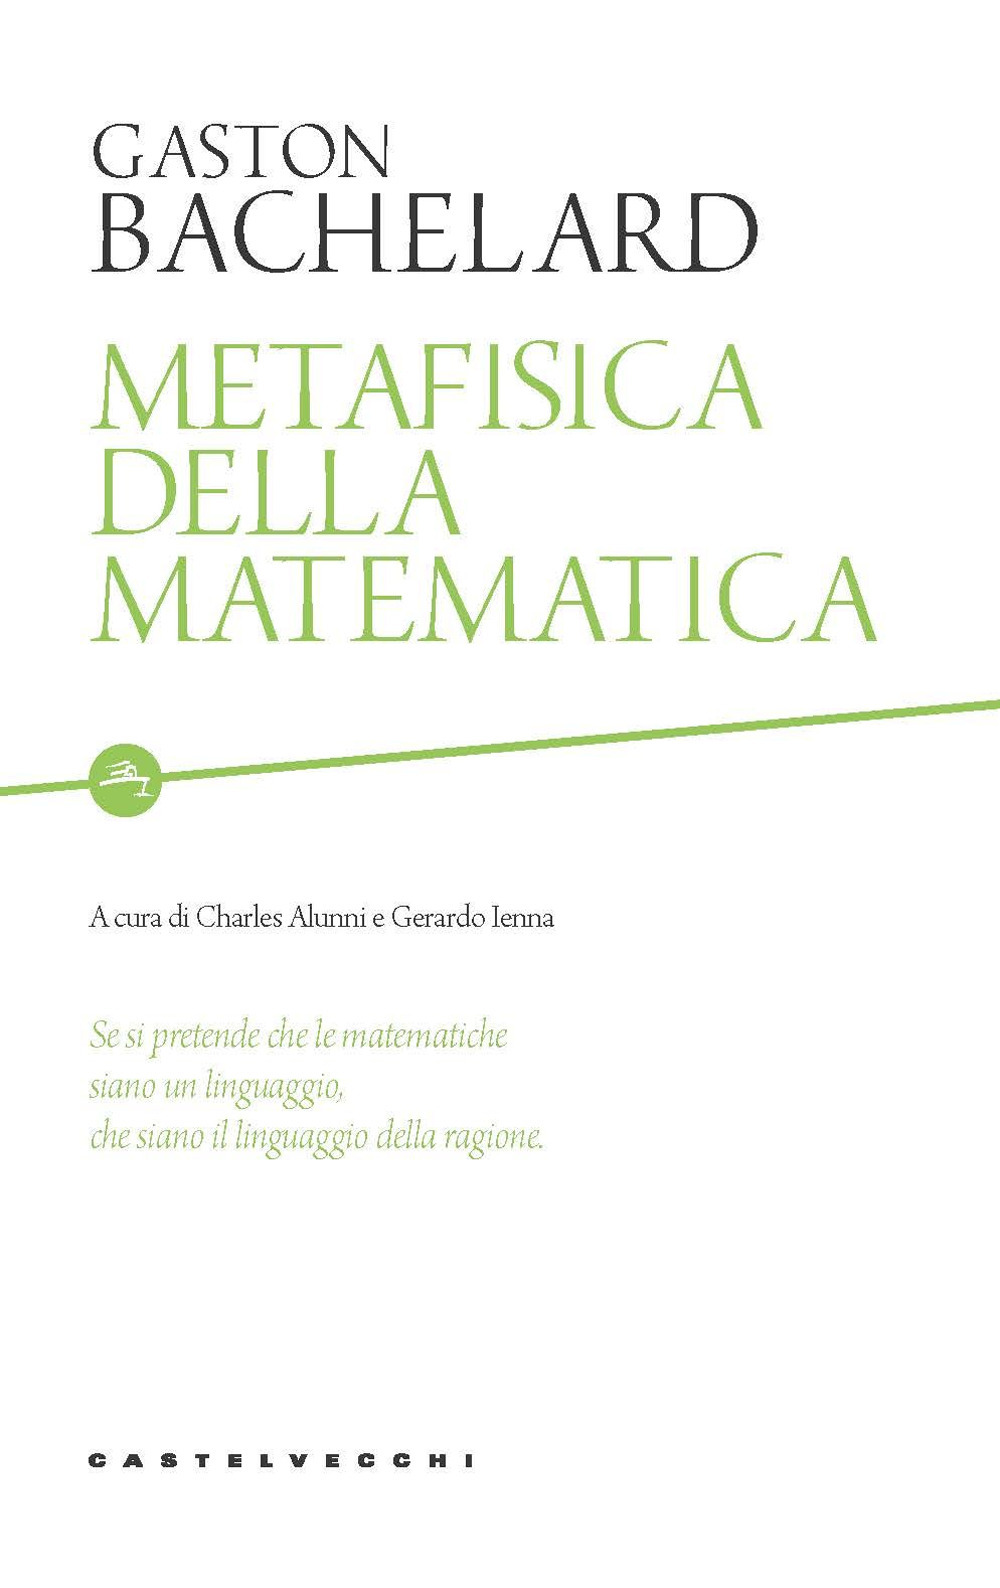 METAFISICA DELLA MATEMATICA - Bachelard Gaston; Alunni C. (cur.); Ienna G. (cur.) - 9788832829518